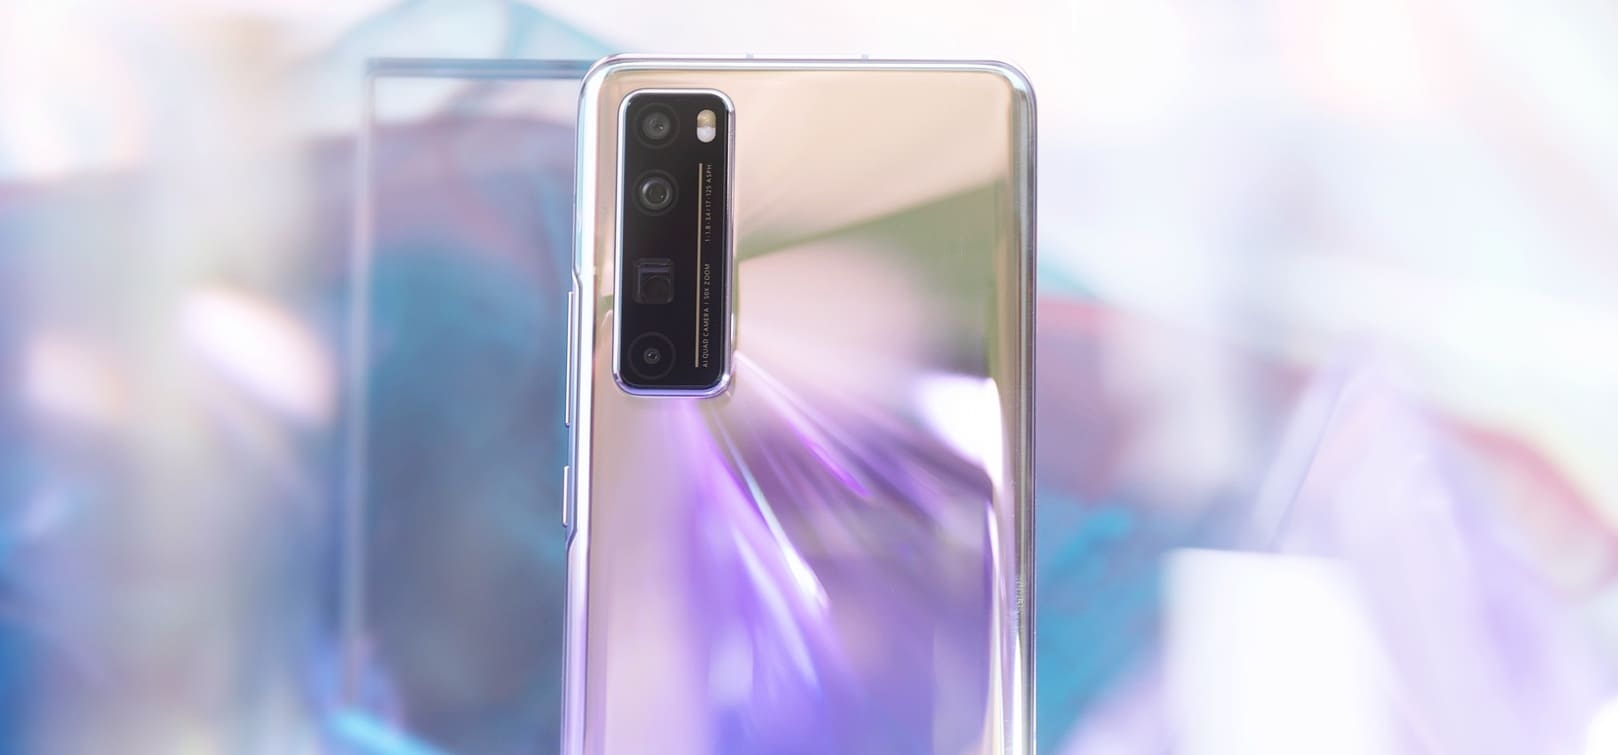 HUAWEI выпустила 3 новых смартфона: Nova 7, Nova 7 SE и Nova 7 Pro